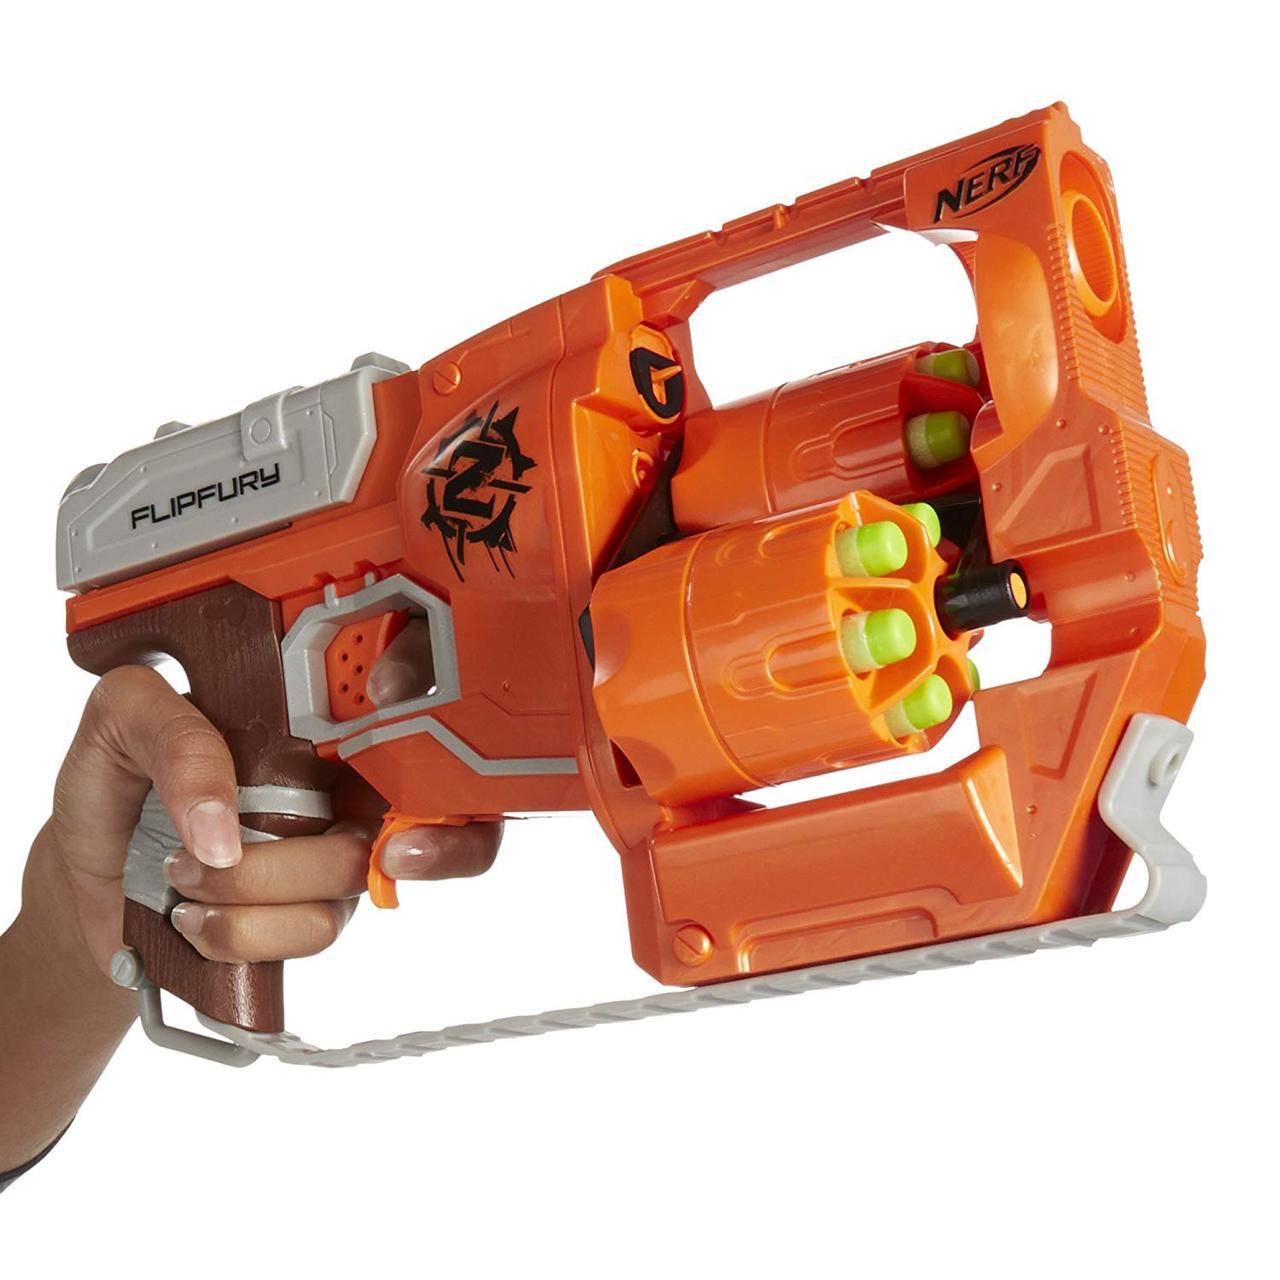 Детское оружие бластер Нерф Зомби Страйк Переворот Nerf Zombie Strike FlipFury Blaster A9603